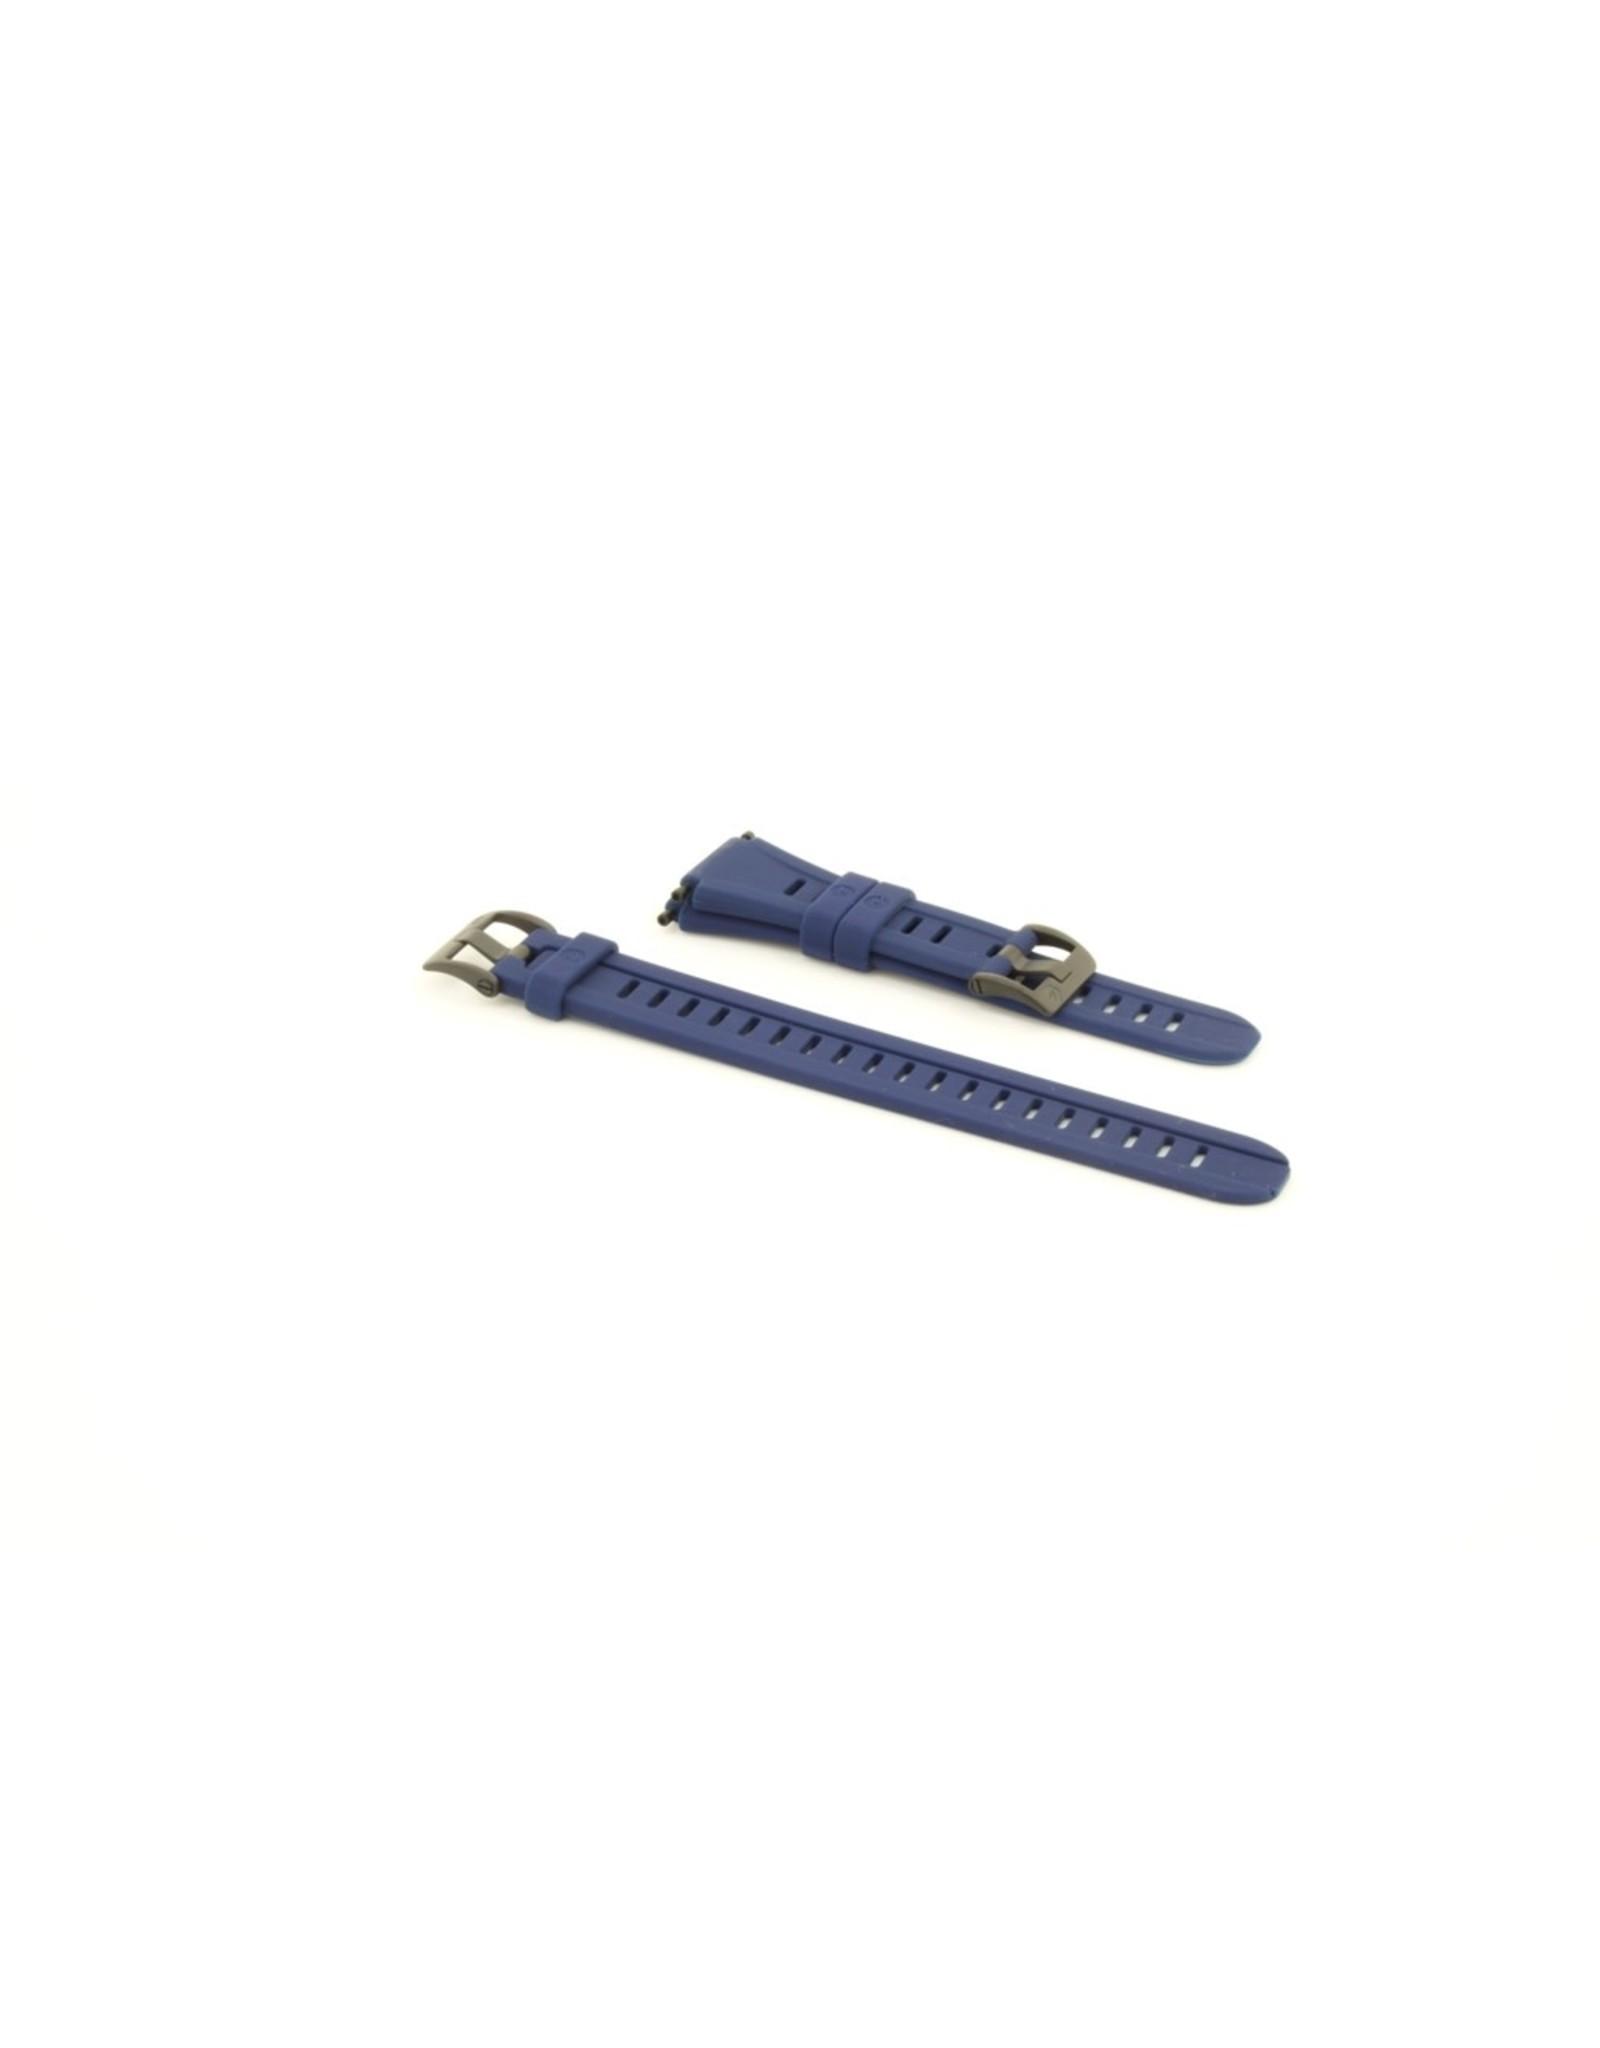 Shearwater Teric Color Strap Kit